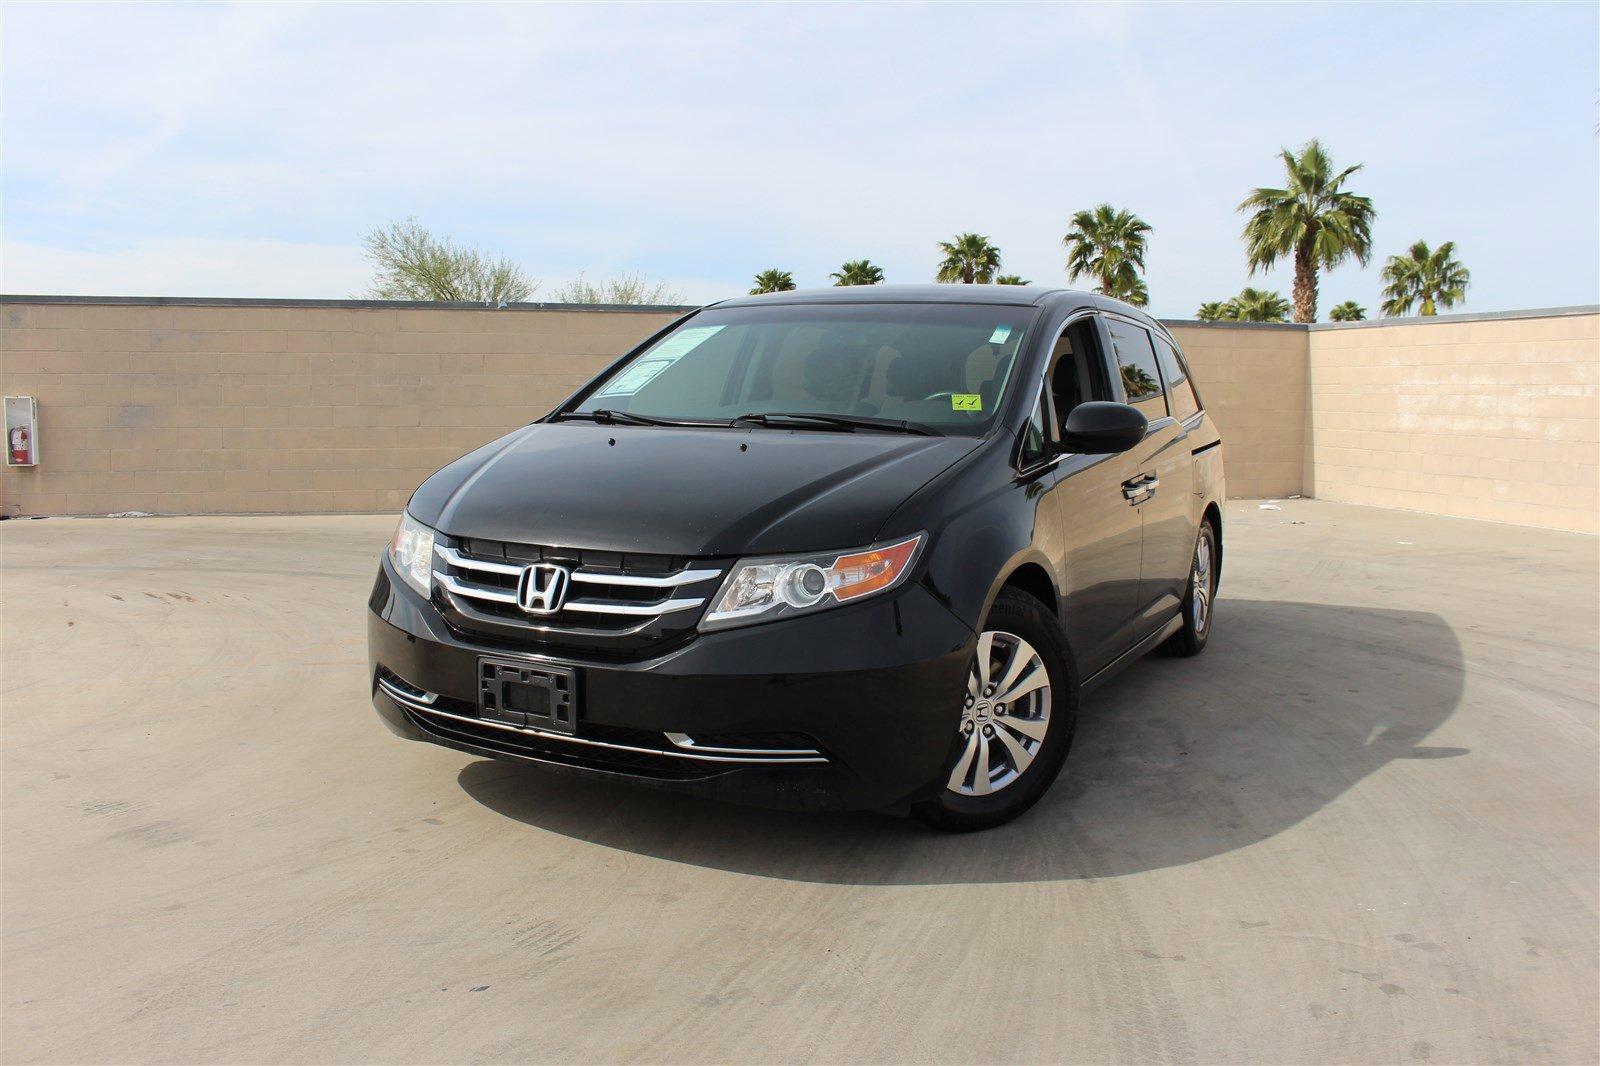 2014 Honda Odyssey EX image